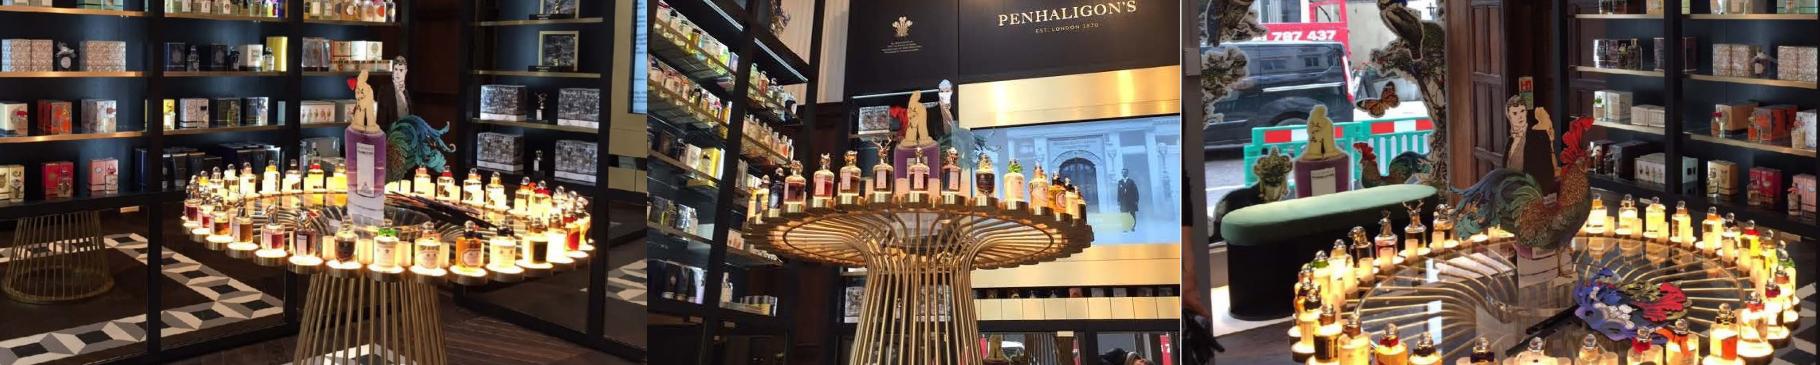 Penhaligon's Mayfair Store